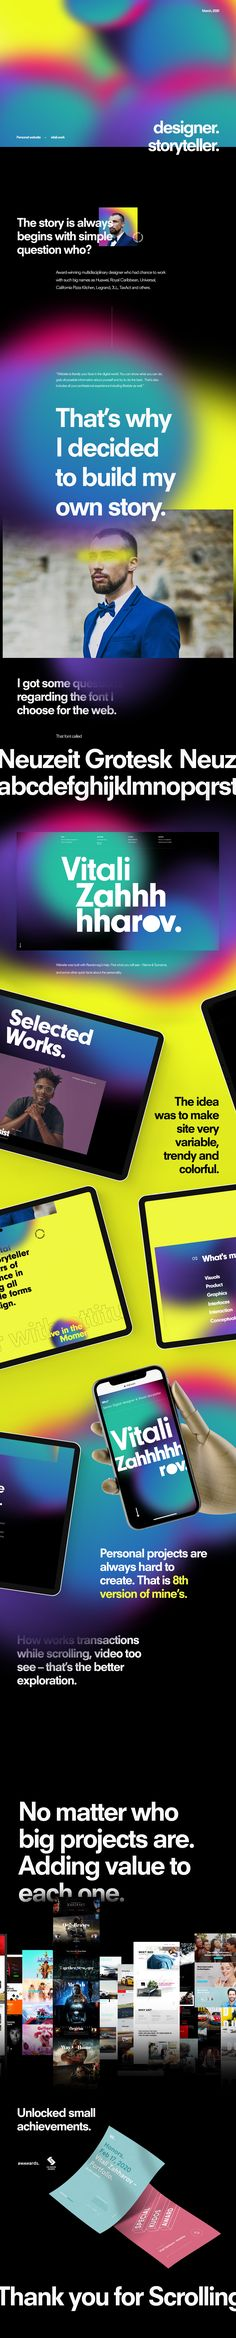 www.vitali.work Product Design, Mobile App, It Works, Presentation, Web Design, Ads, Design Web, Mobile Applications, Nailed It